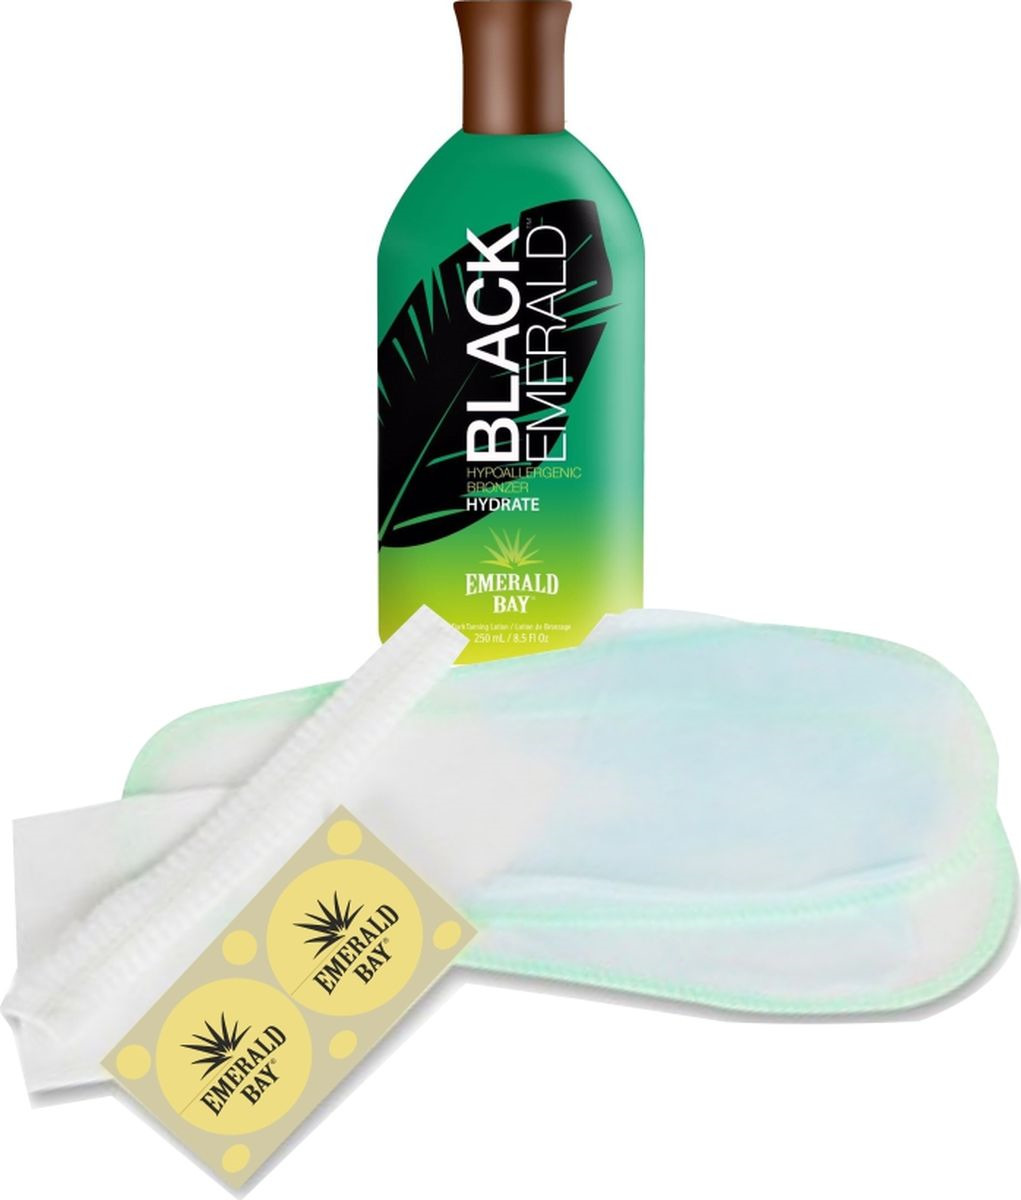 Комплект для солярия Emerald Bay Black Emerald, 250 мл крем для загара в солярии emerald bay choco latta love 15 мл х 5 шт